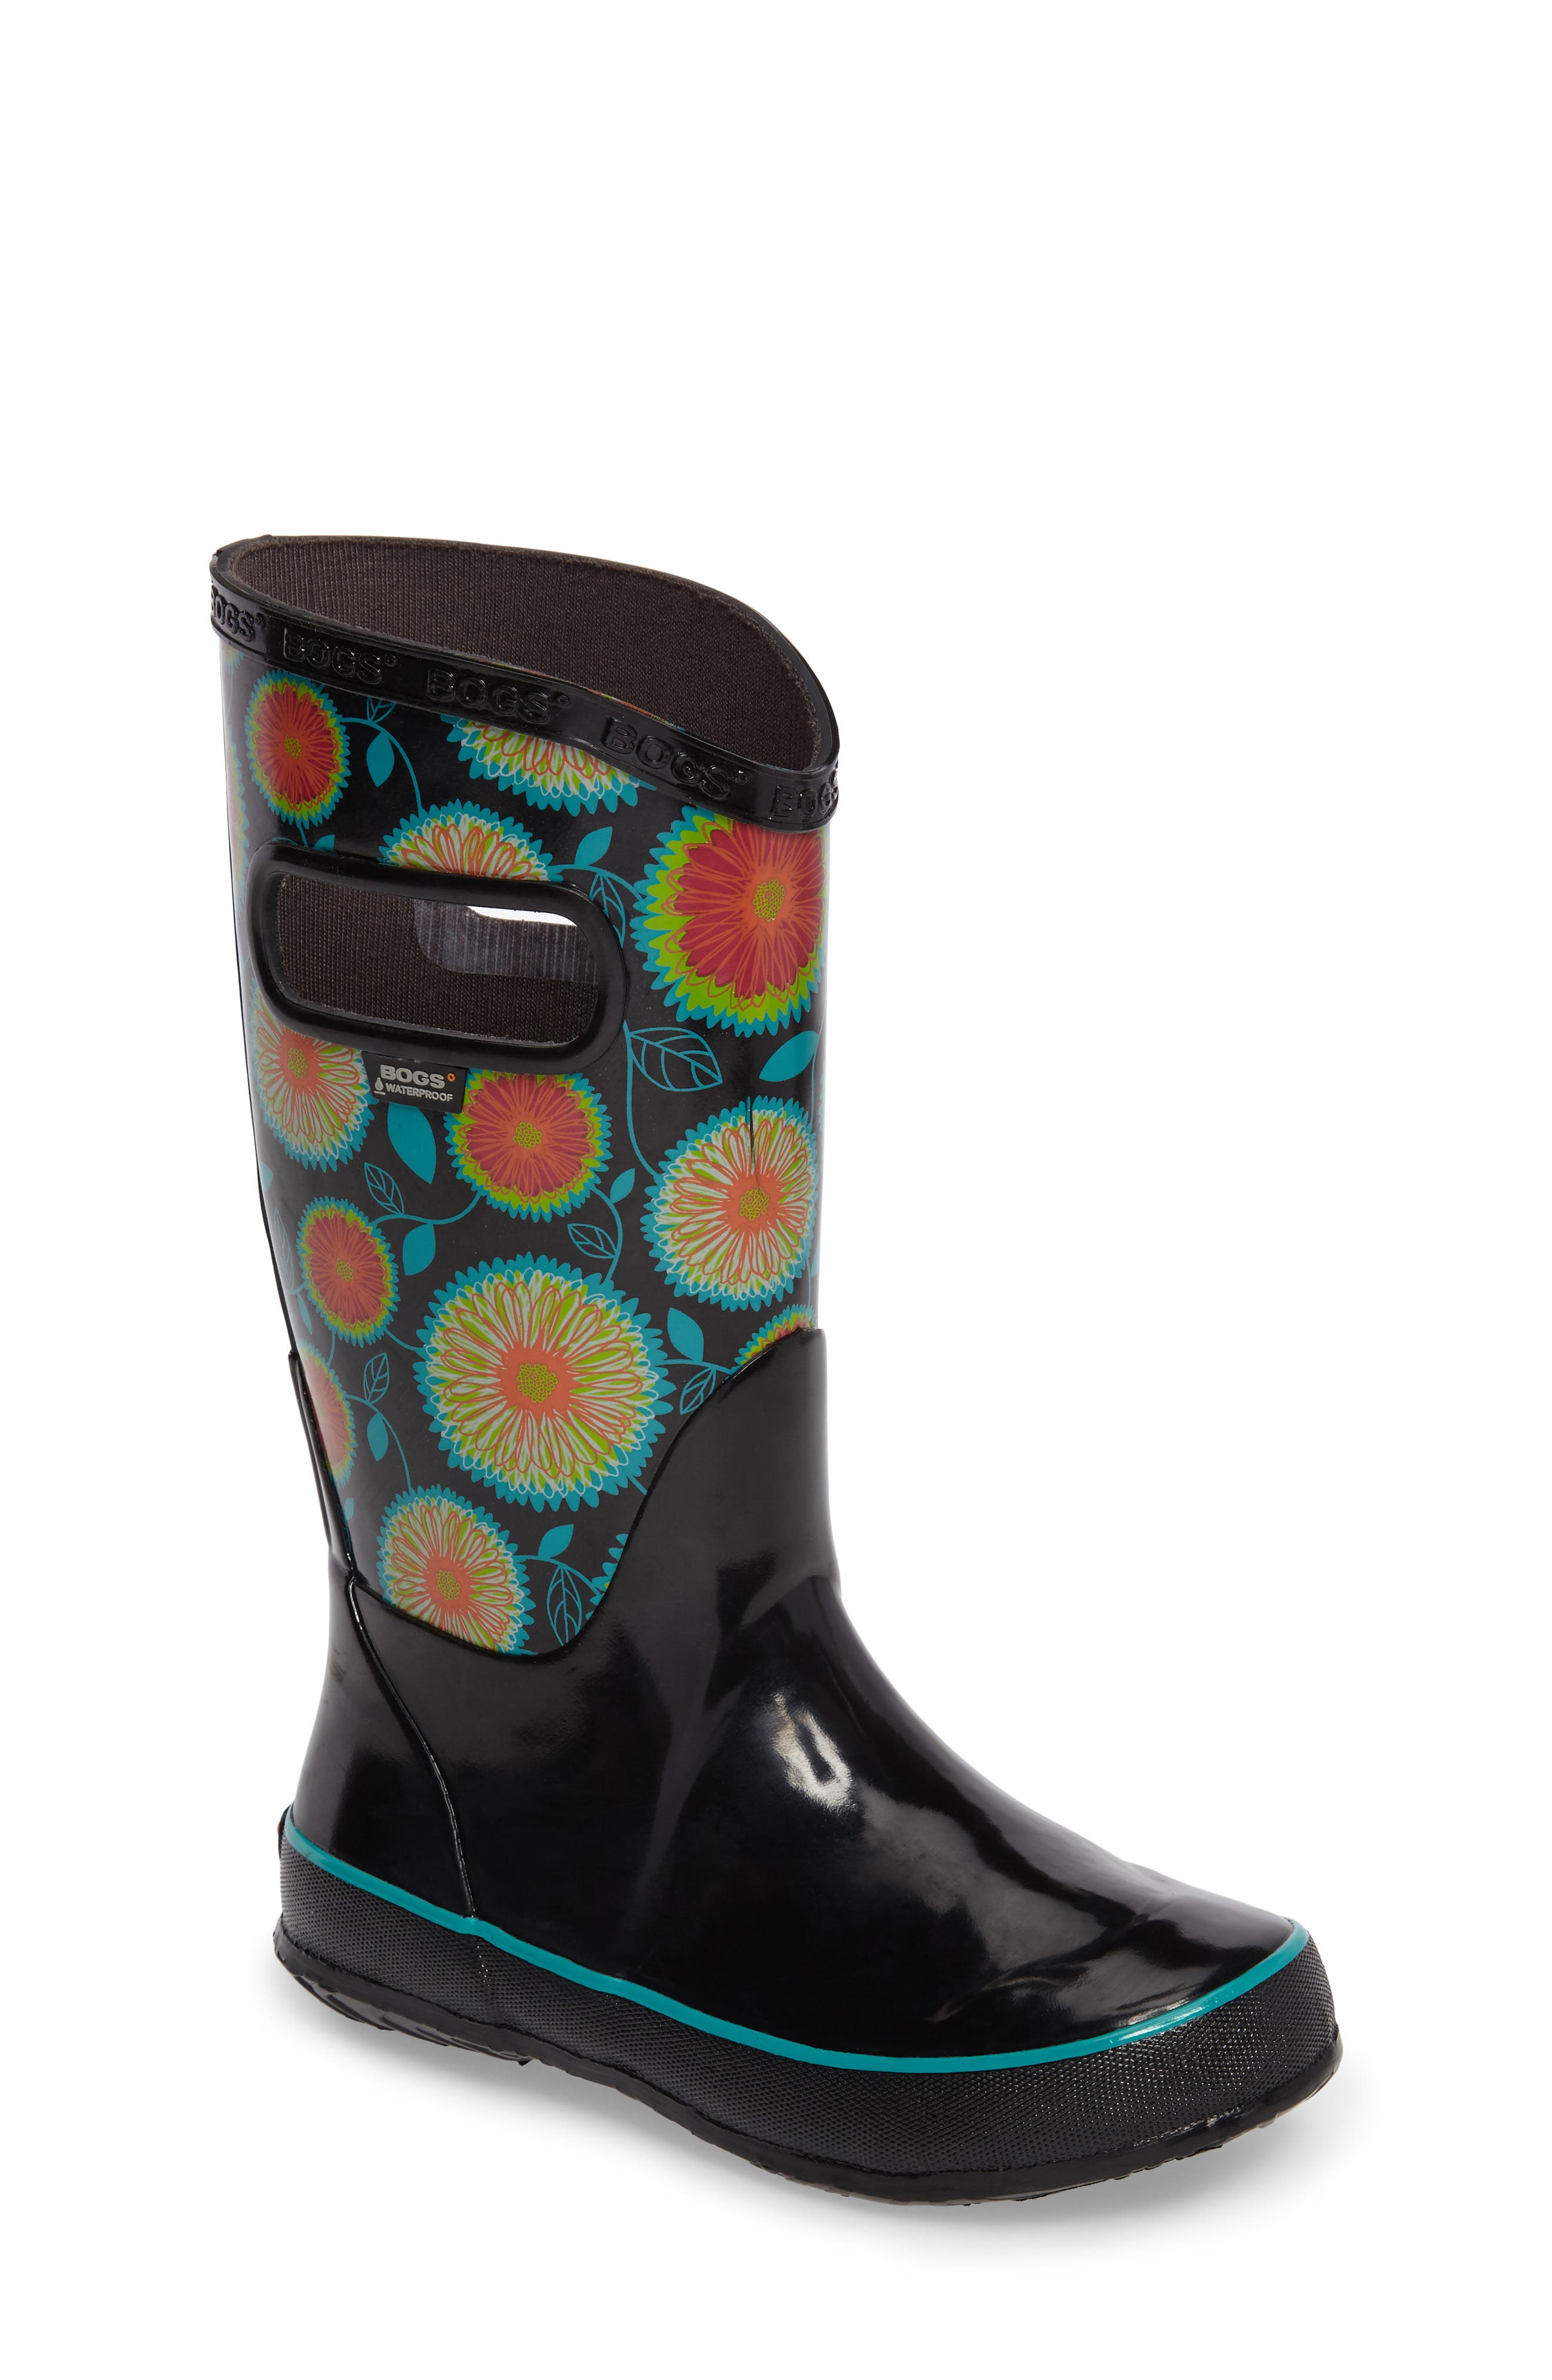 Wildflowers Waterproof Rubber Rain Boot,                             Main thumbnail 1, color,                             009